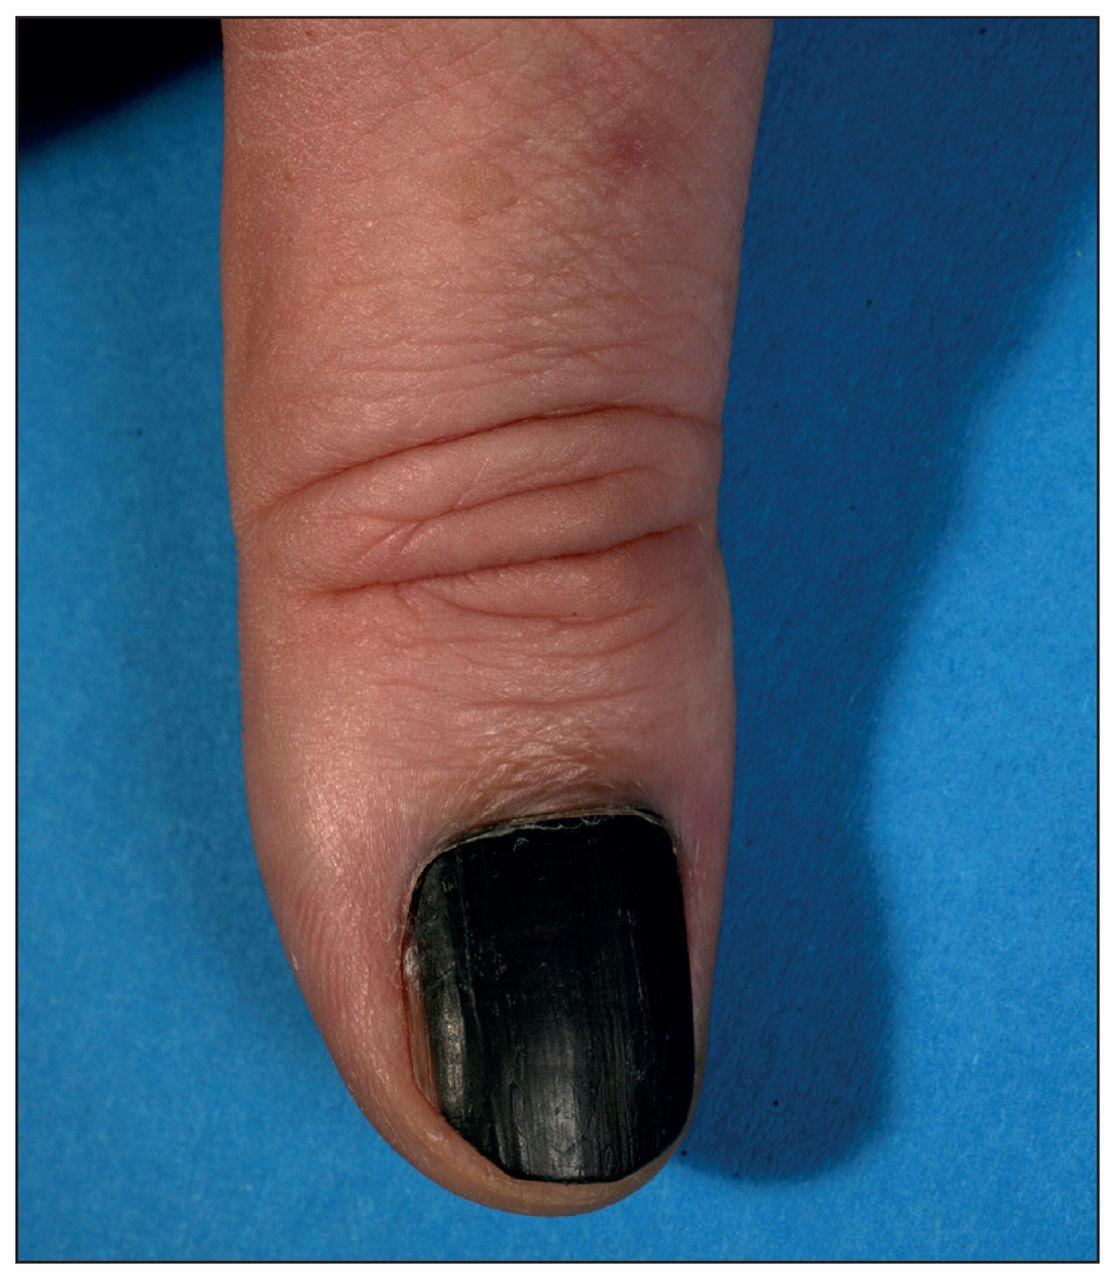 Subungual malignant melanoma | CMAJ